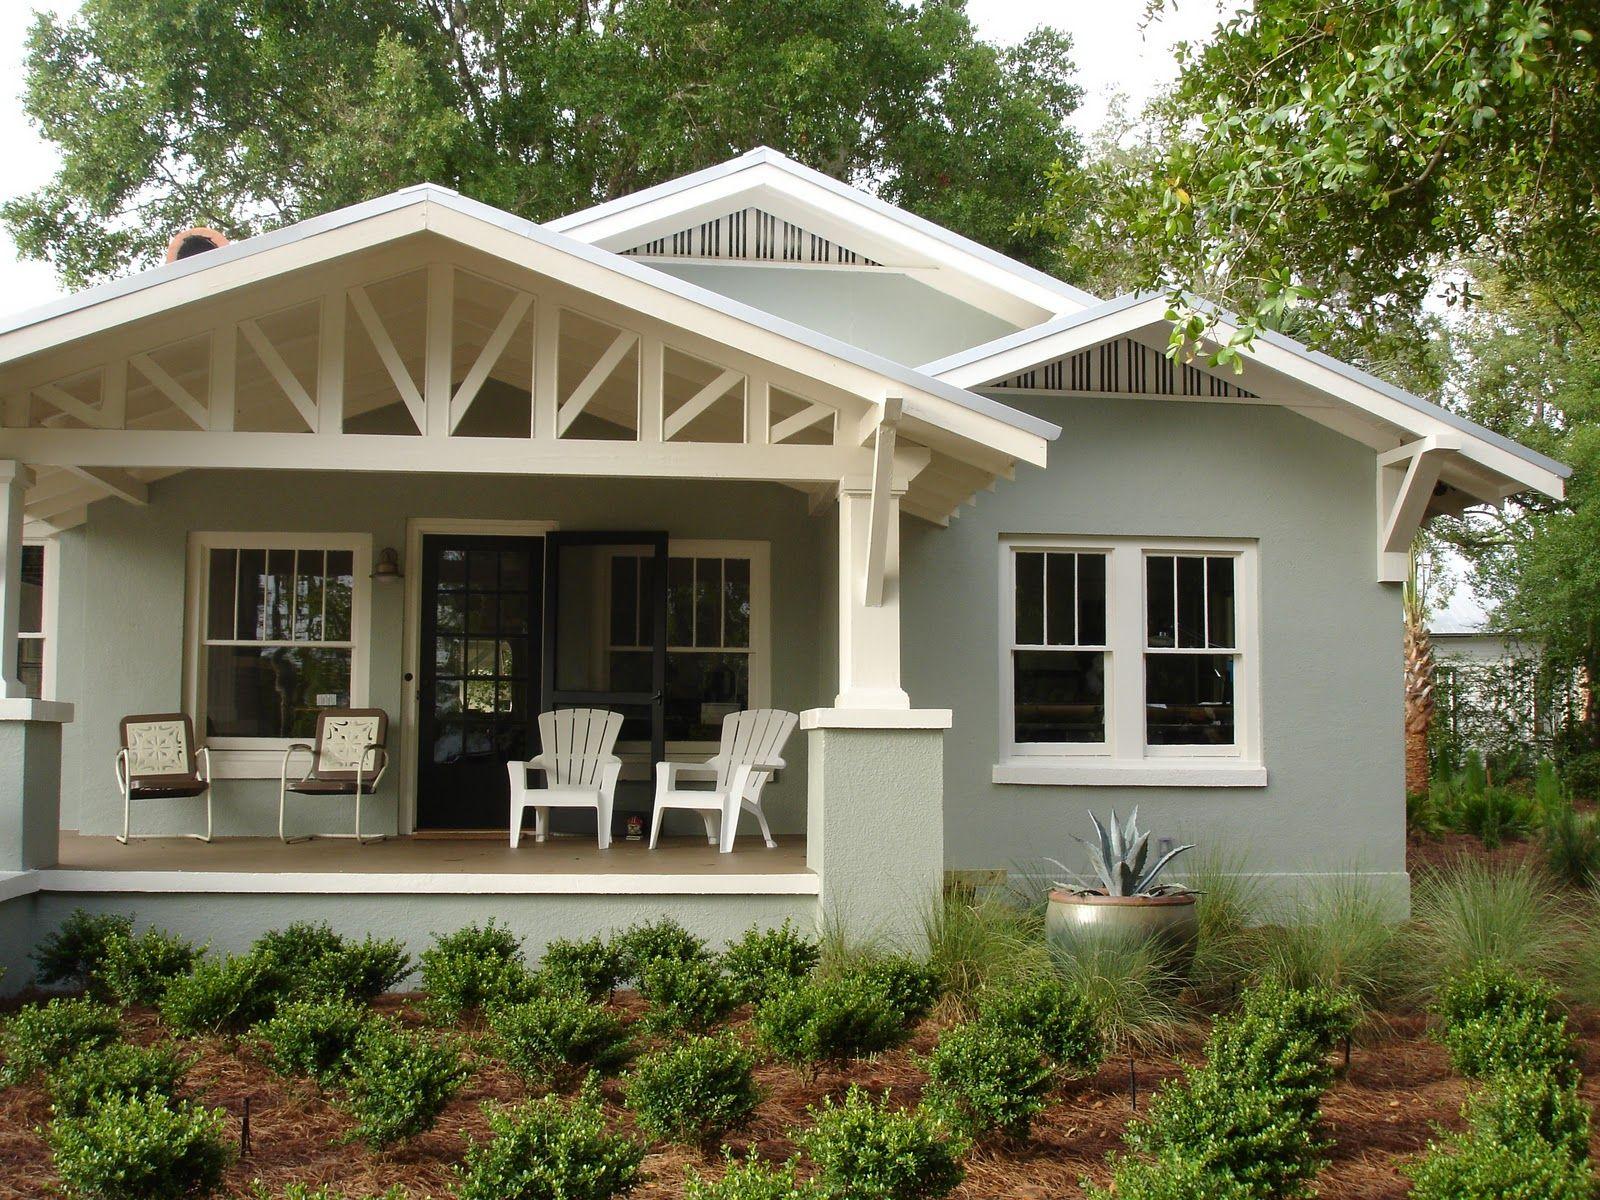 Merveilleux Simple Cute House